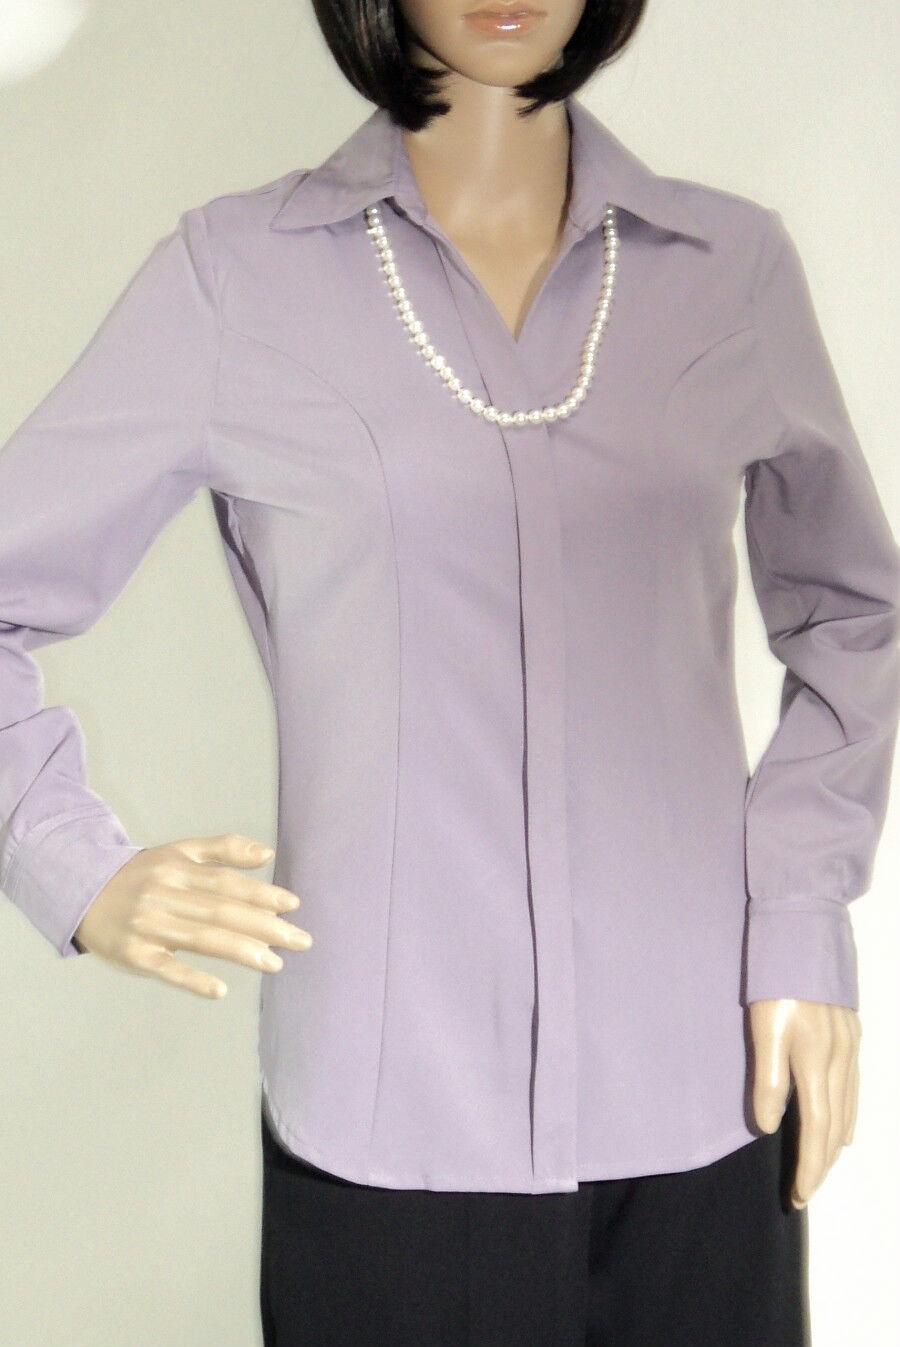 Ladies Solid purplec Long Sleeve Button Up Dress Shirt  Top  Blouse